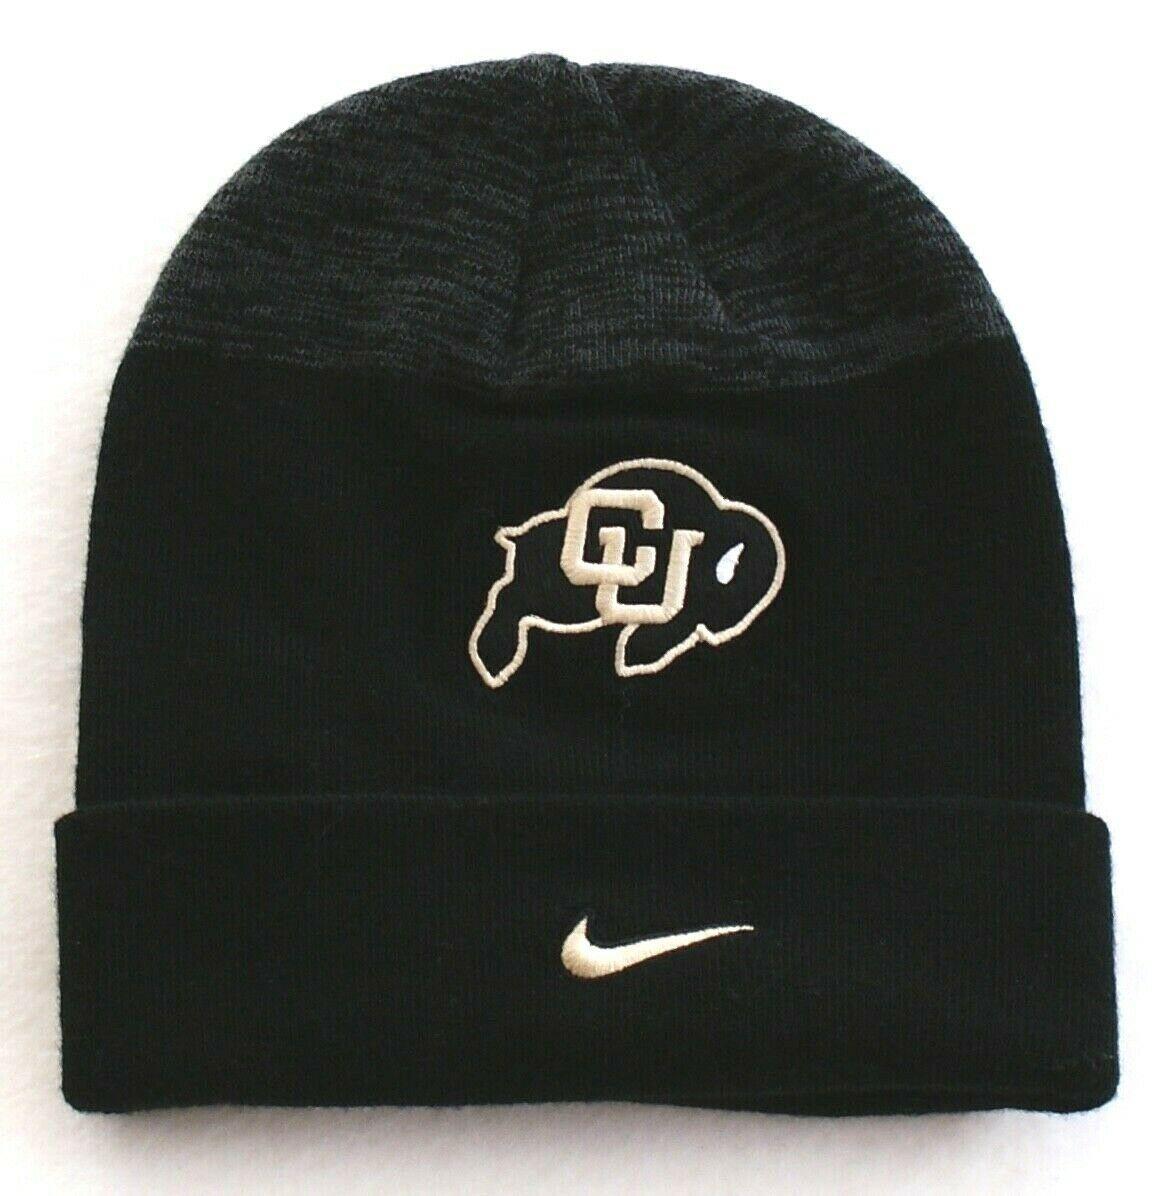 save off 1f4ba 0e6e6 Nike Colorado Buffaloes Black Knit Cuff Beanie Youth Boy s 8-20 NWT -  39.59